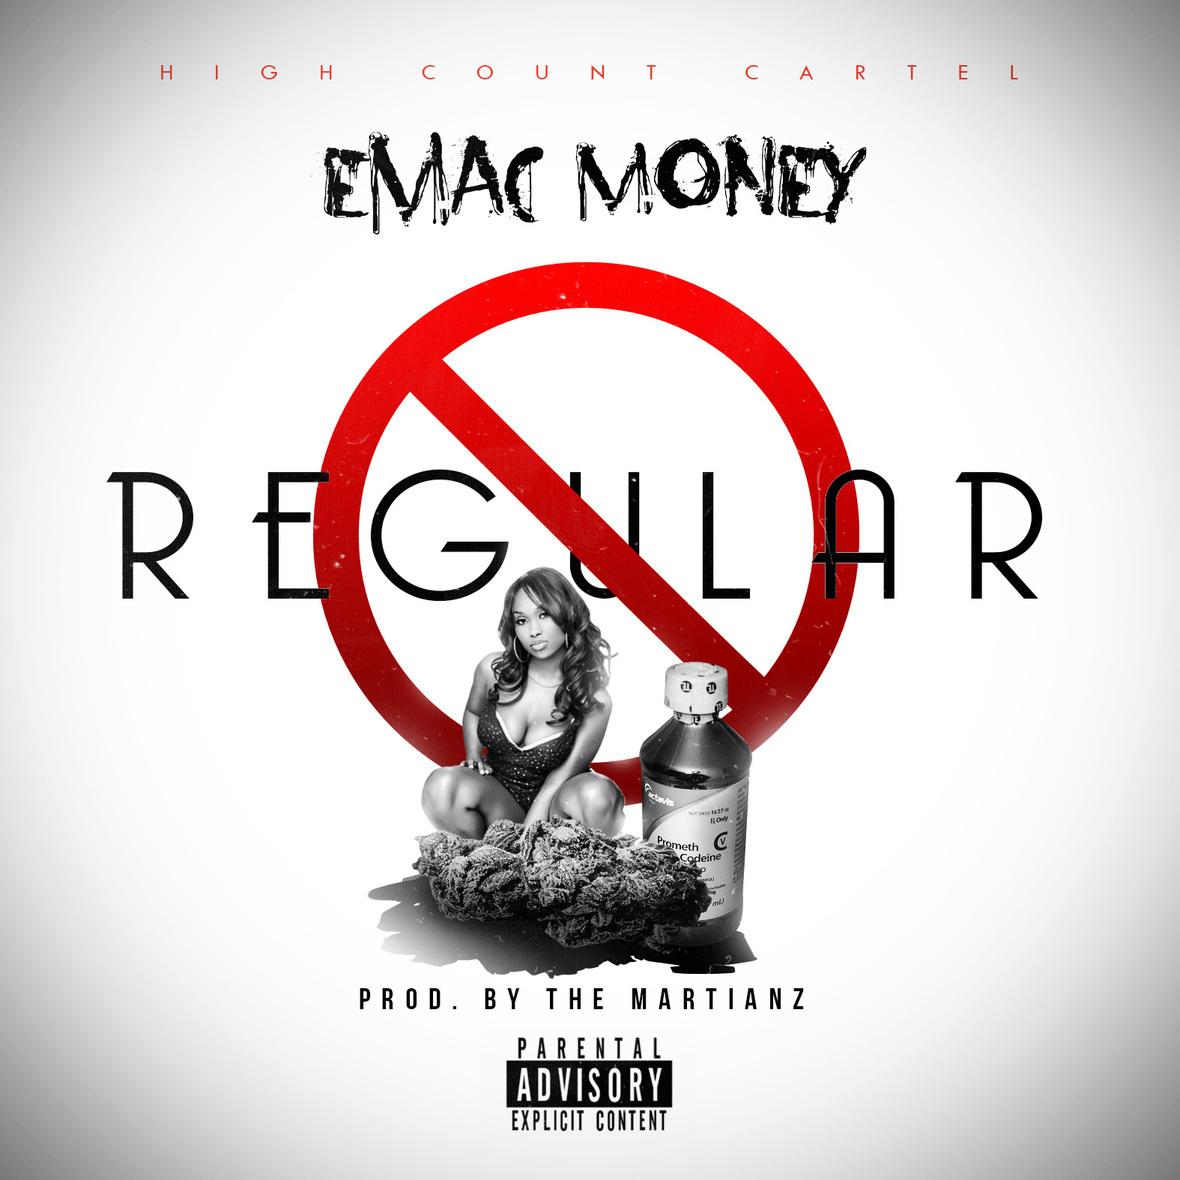 Emac Money Regular Front